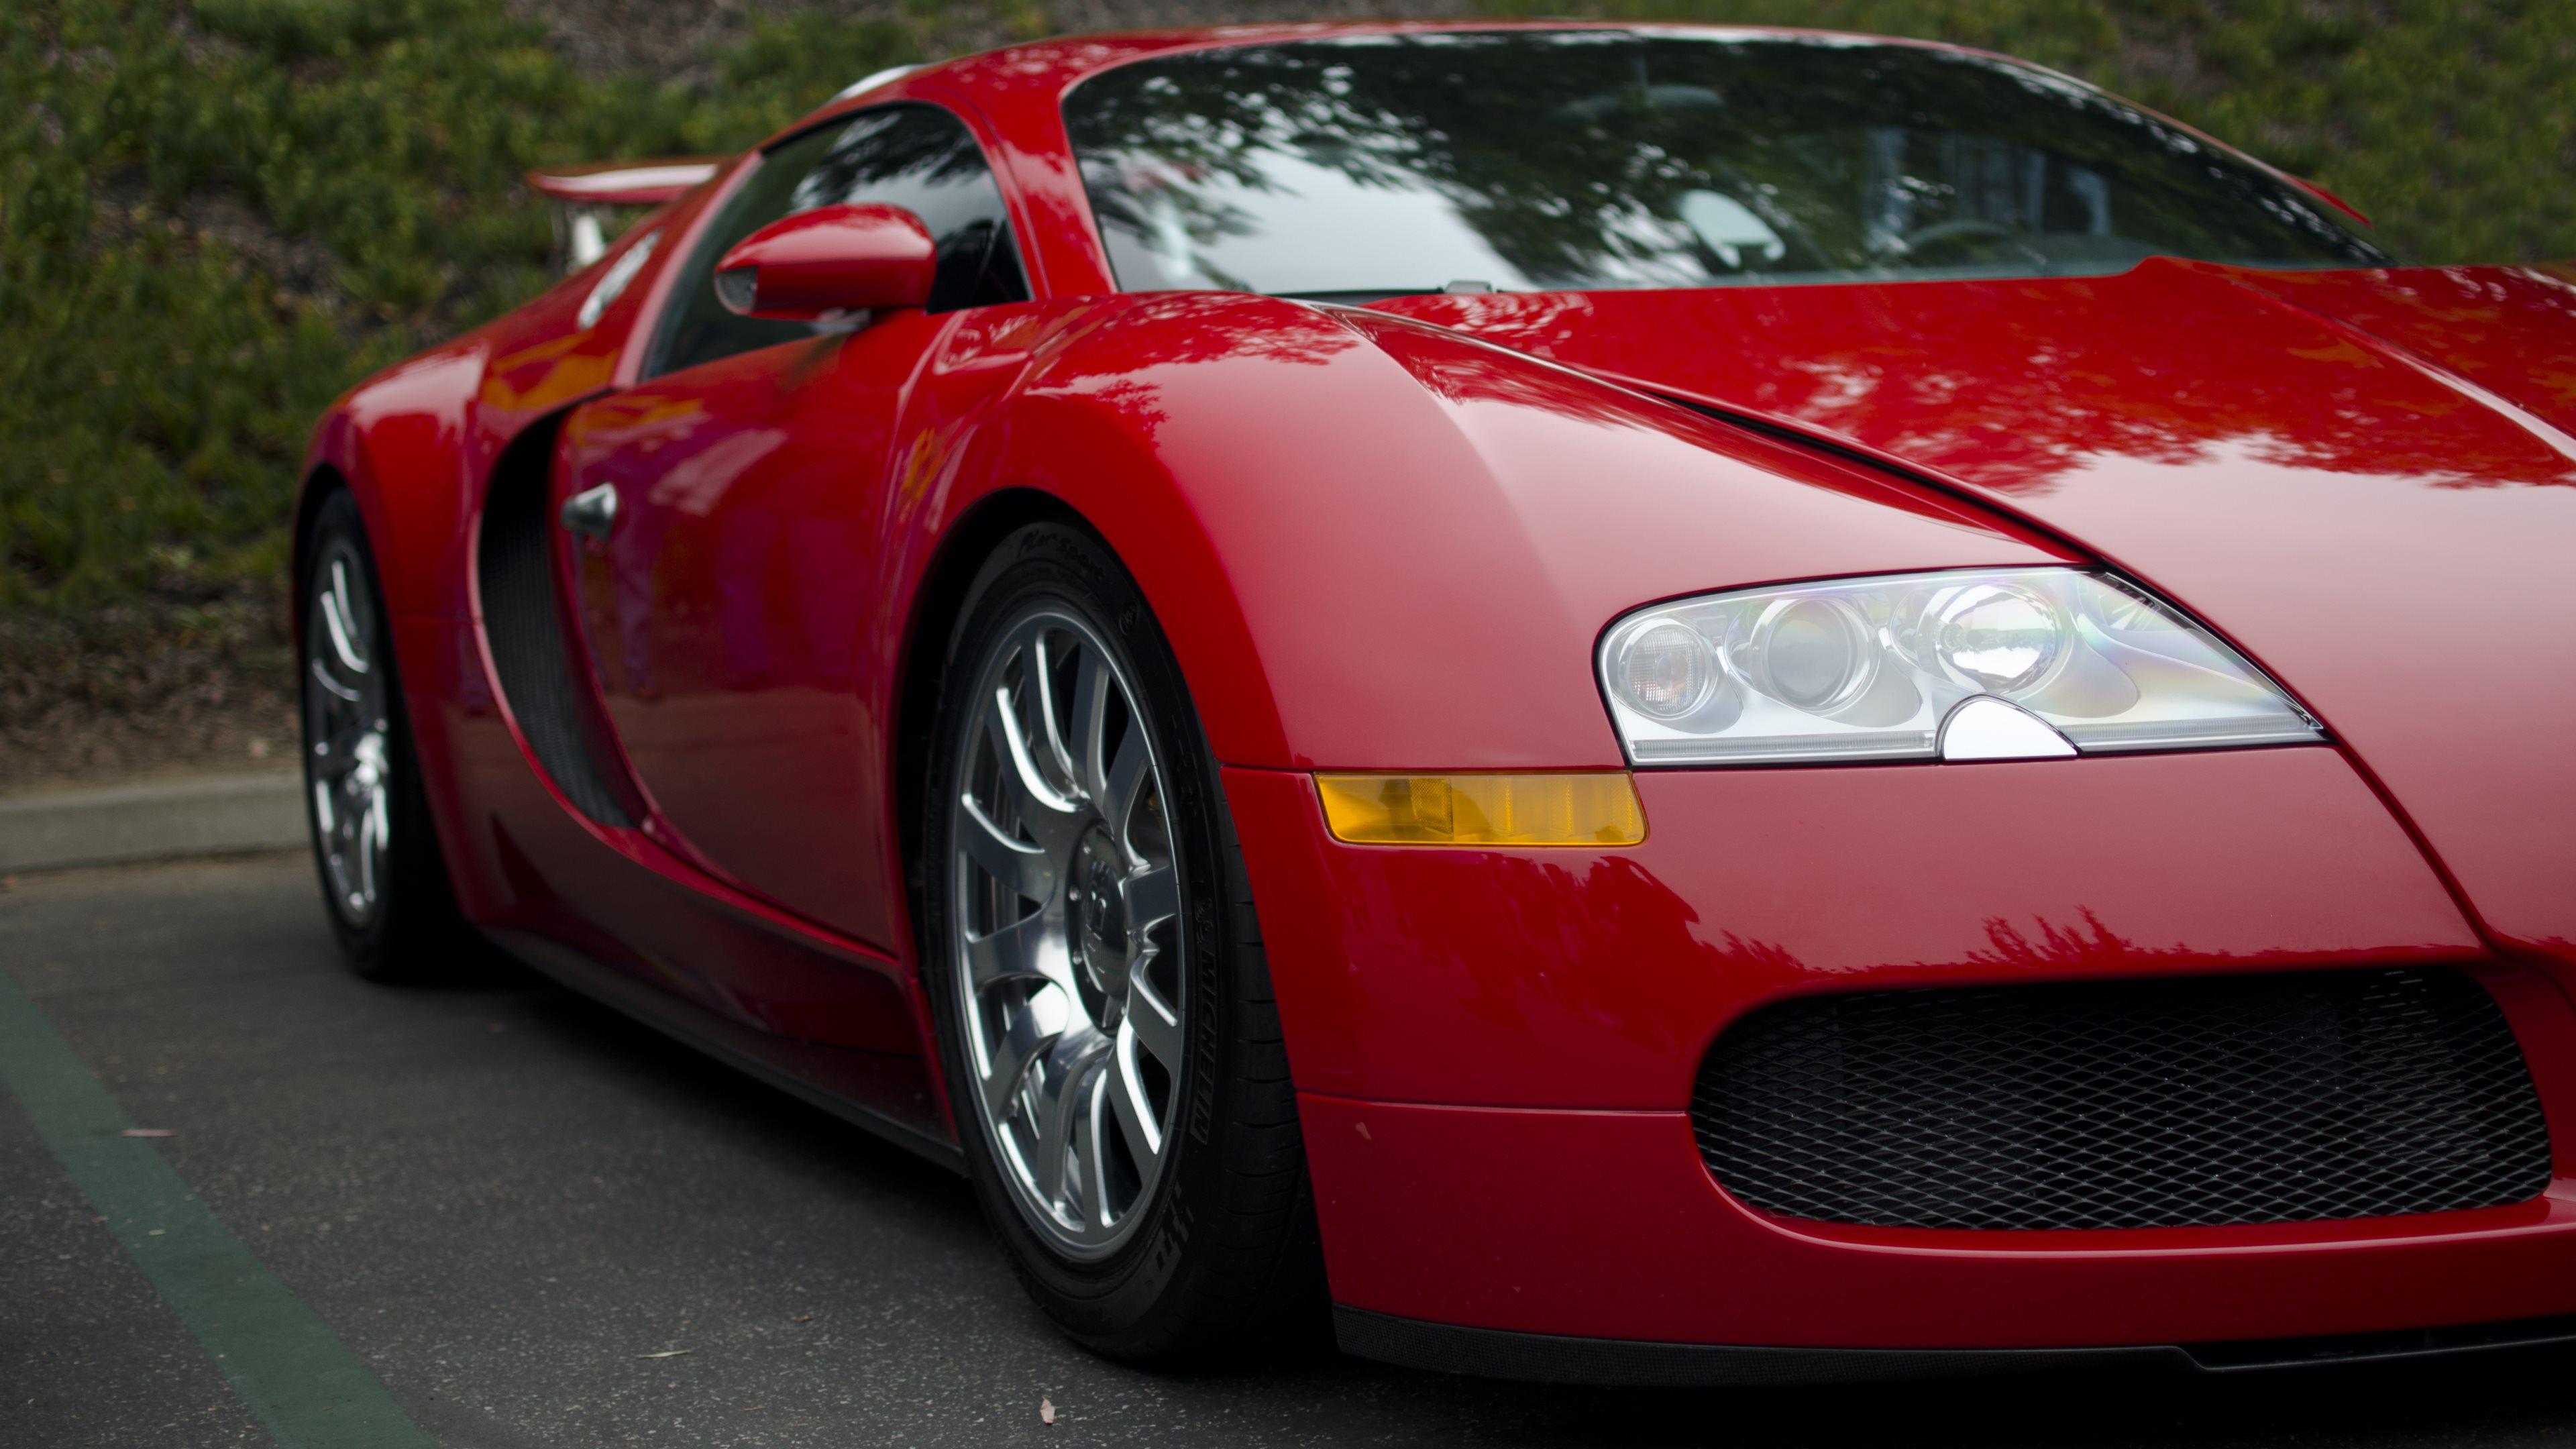 Bugatti Car Hd Wallpapers Free Download For Android Mobile: Bugatti_Veyron 4k Ultra HD Wallpaper